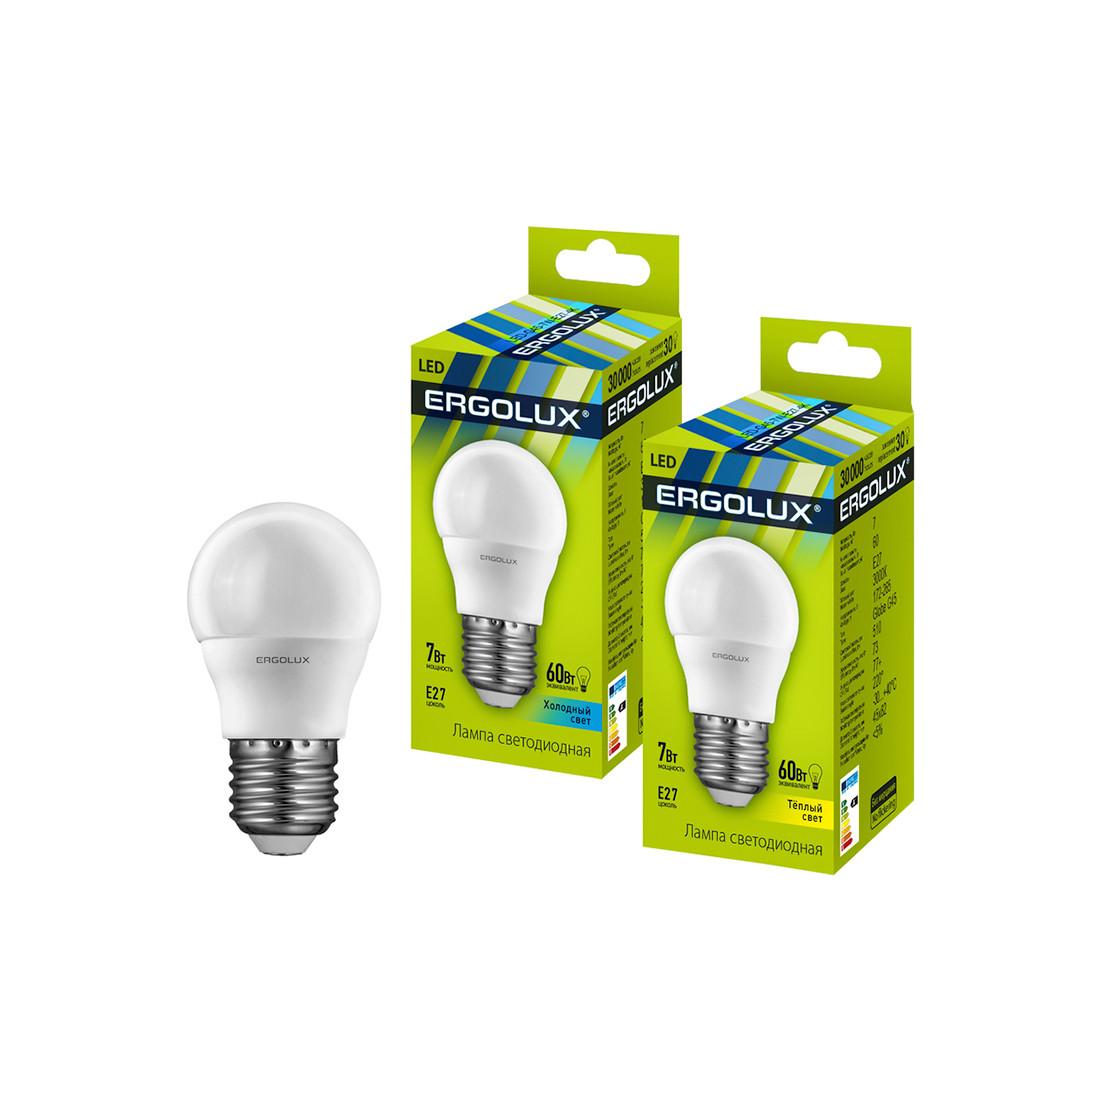 Эл. лампа светодиодная Ergolux G45/3000K/E27/7Вт, Тёплый